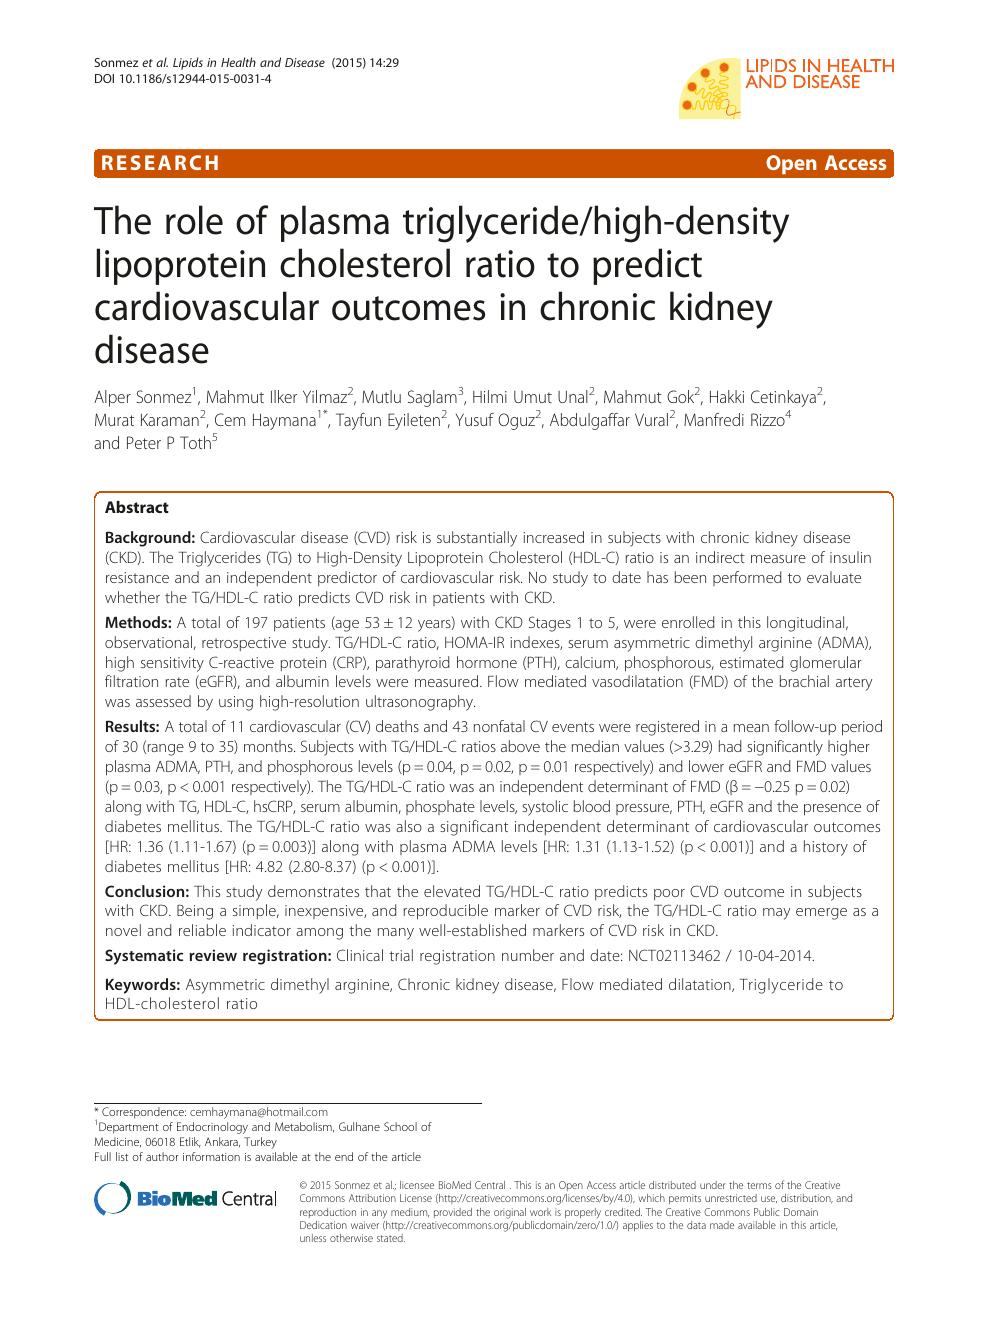 The role of plasma triglyceride/high-density lipoprotein